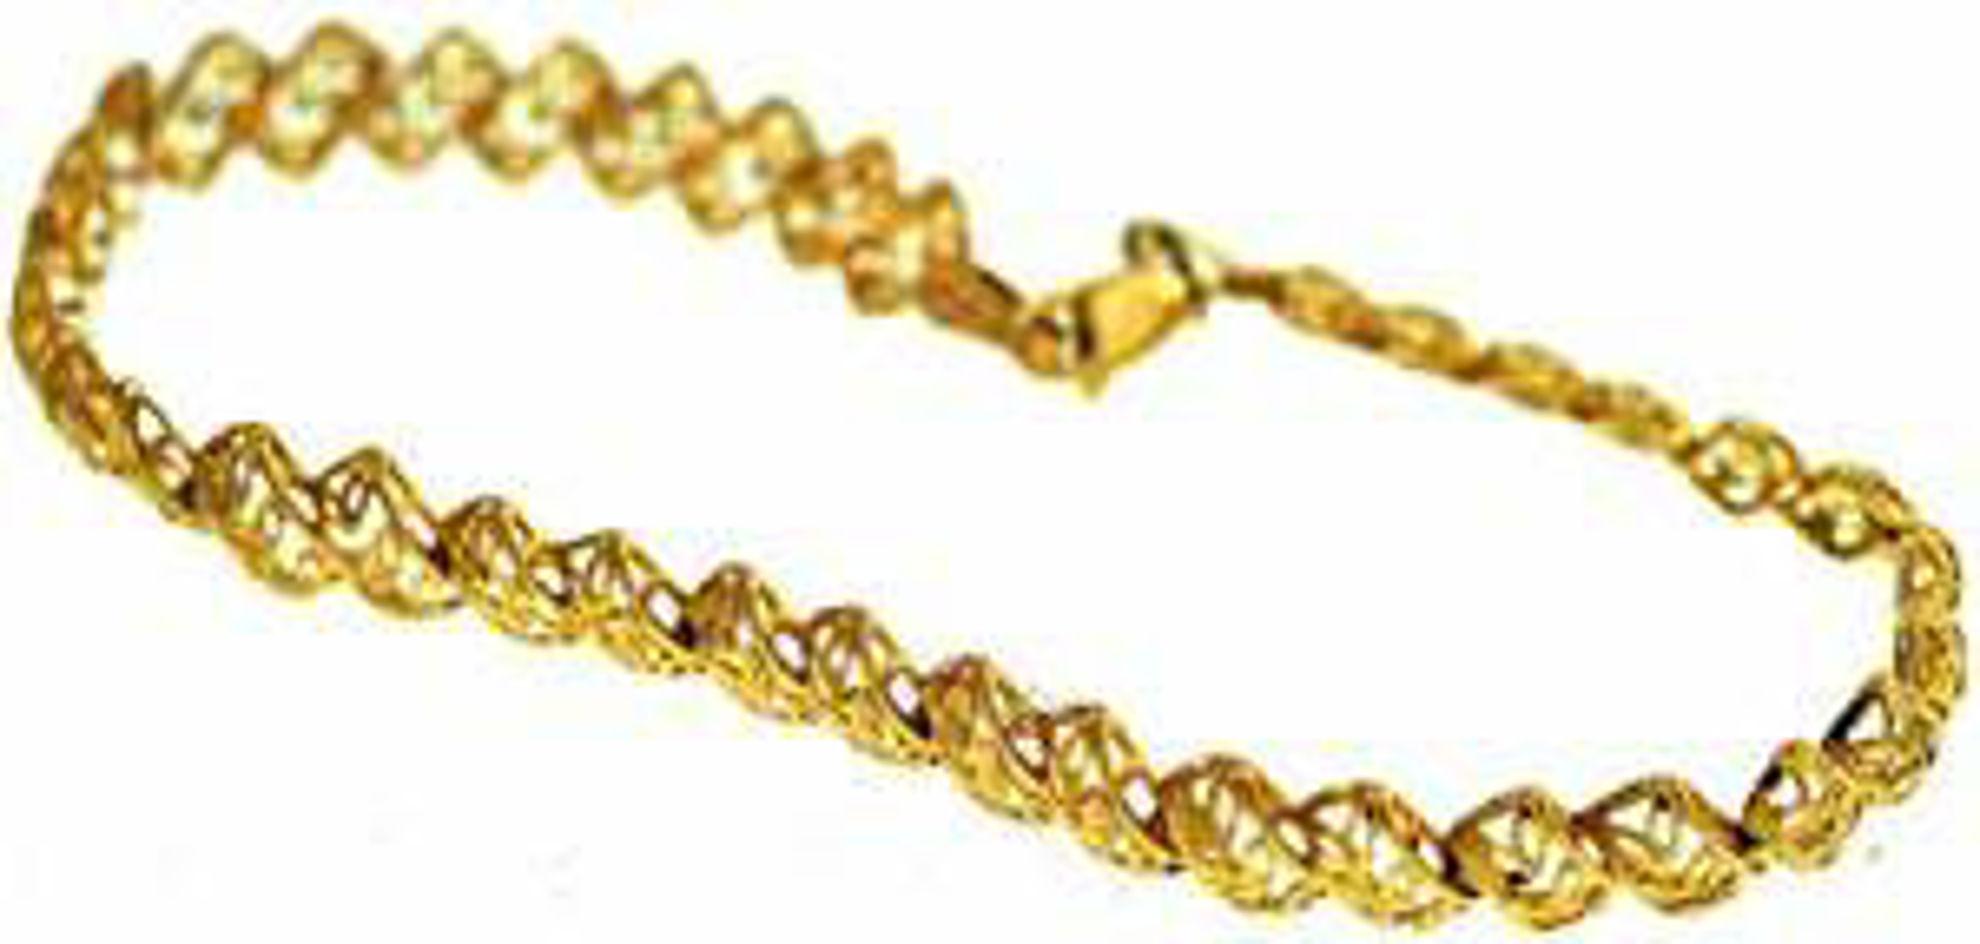 Picture of Bracelets 10kt-3.3 DWT, 5.1 Grams